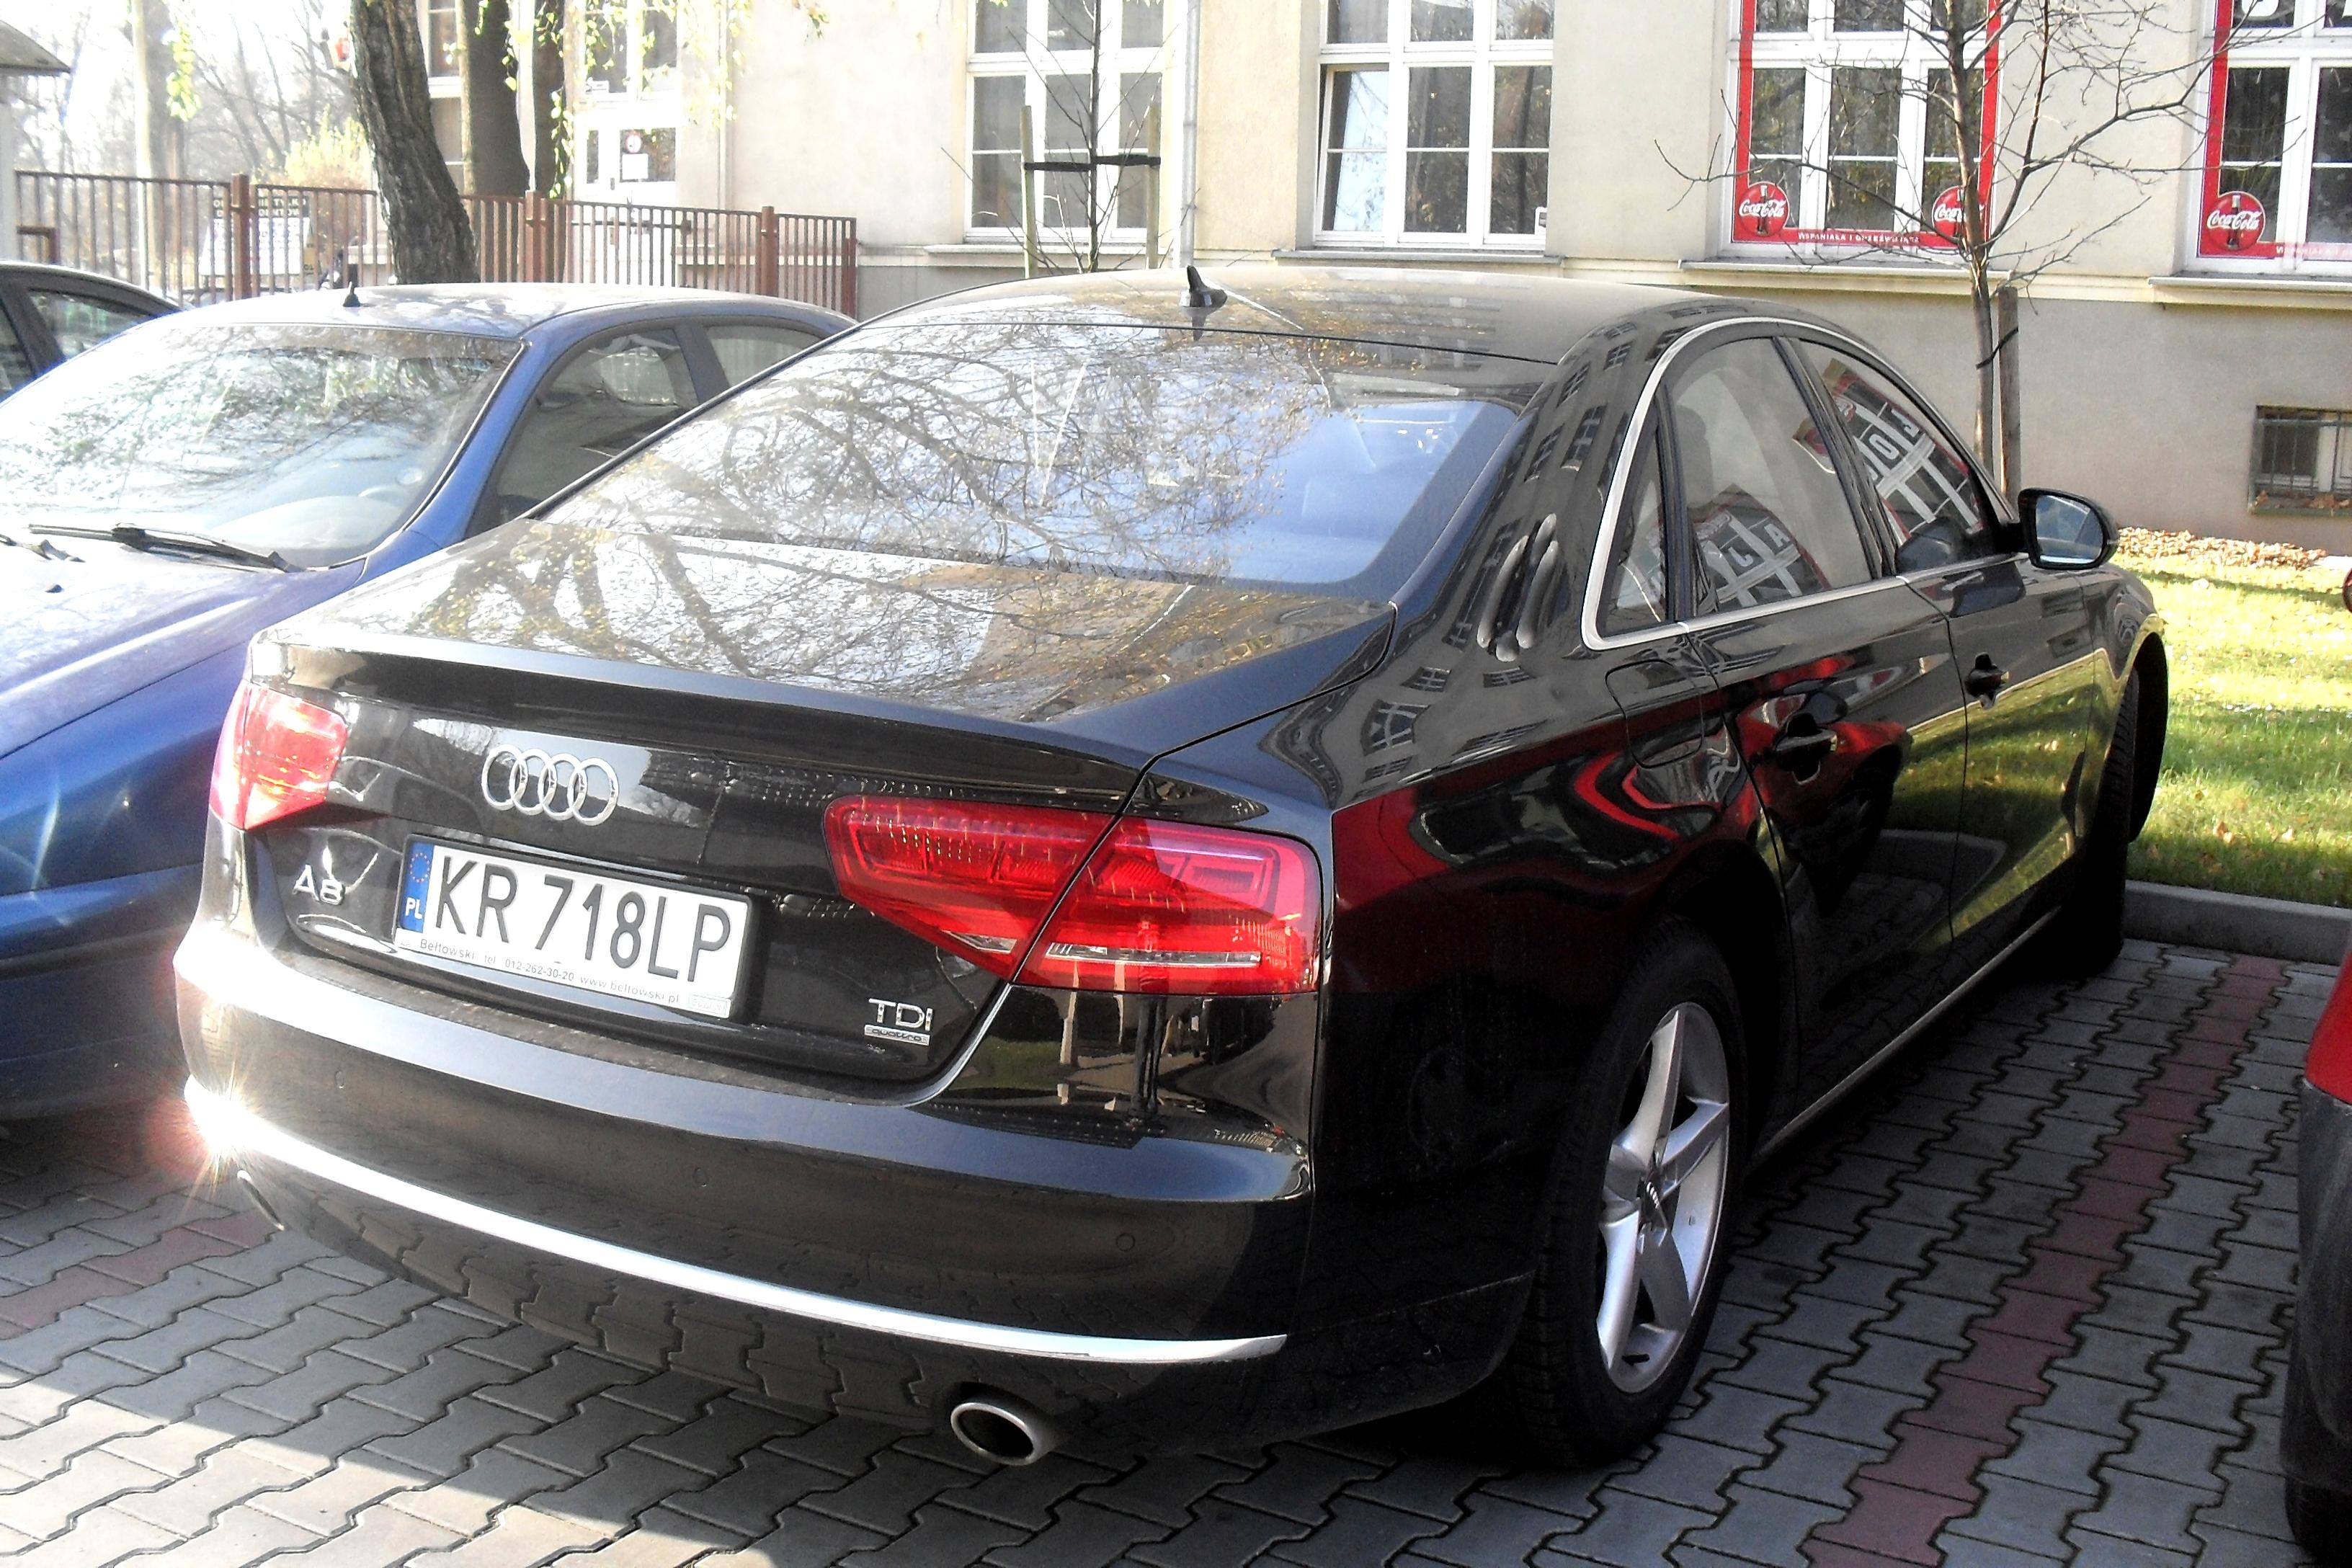 File Audi A8 D4 Krk Jpg Wikimedia Commons